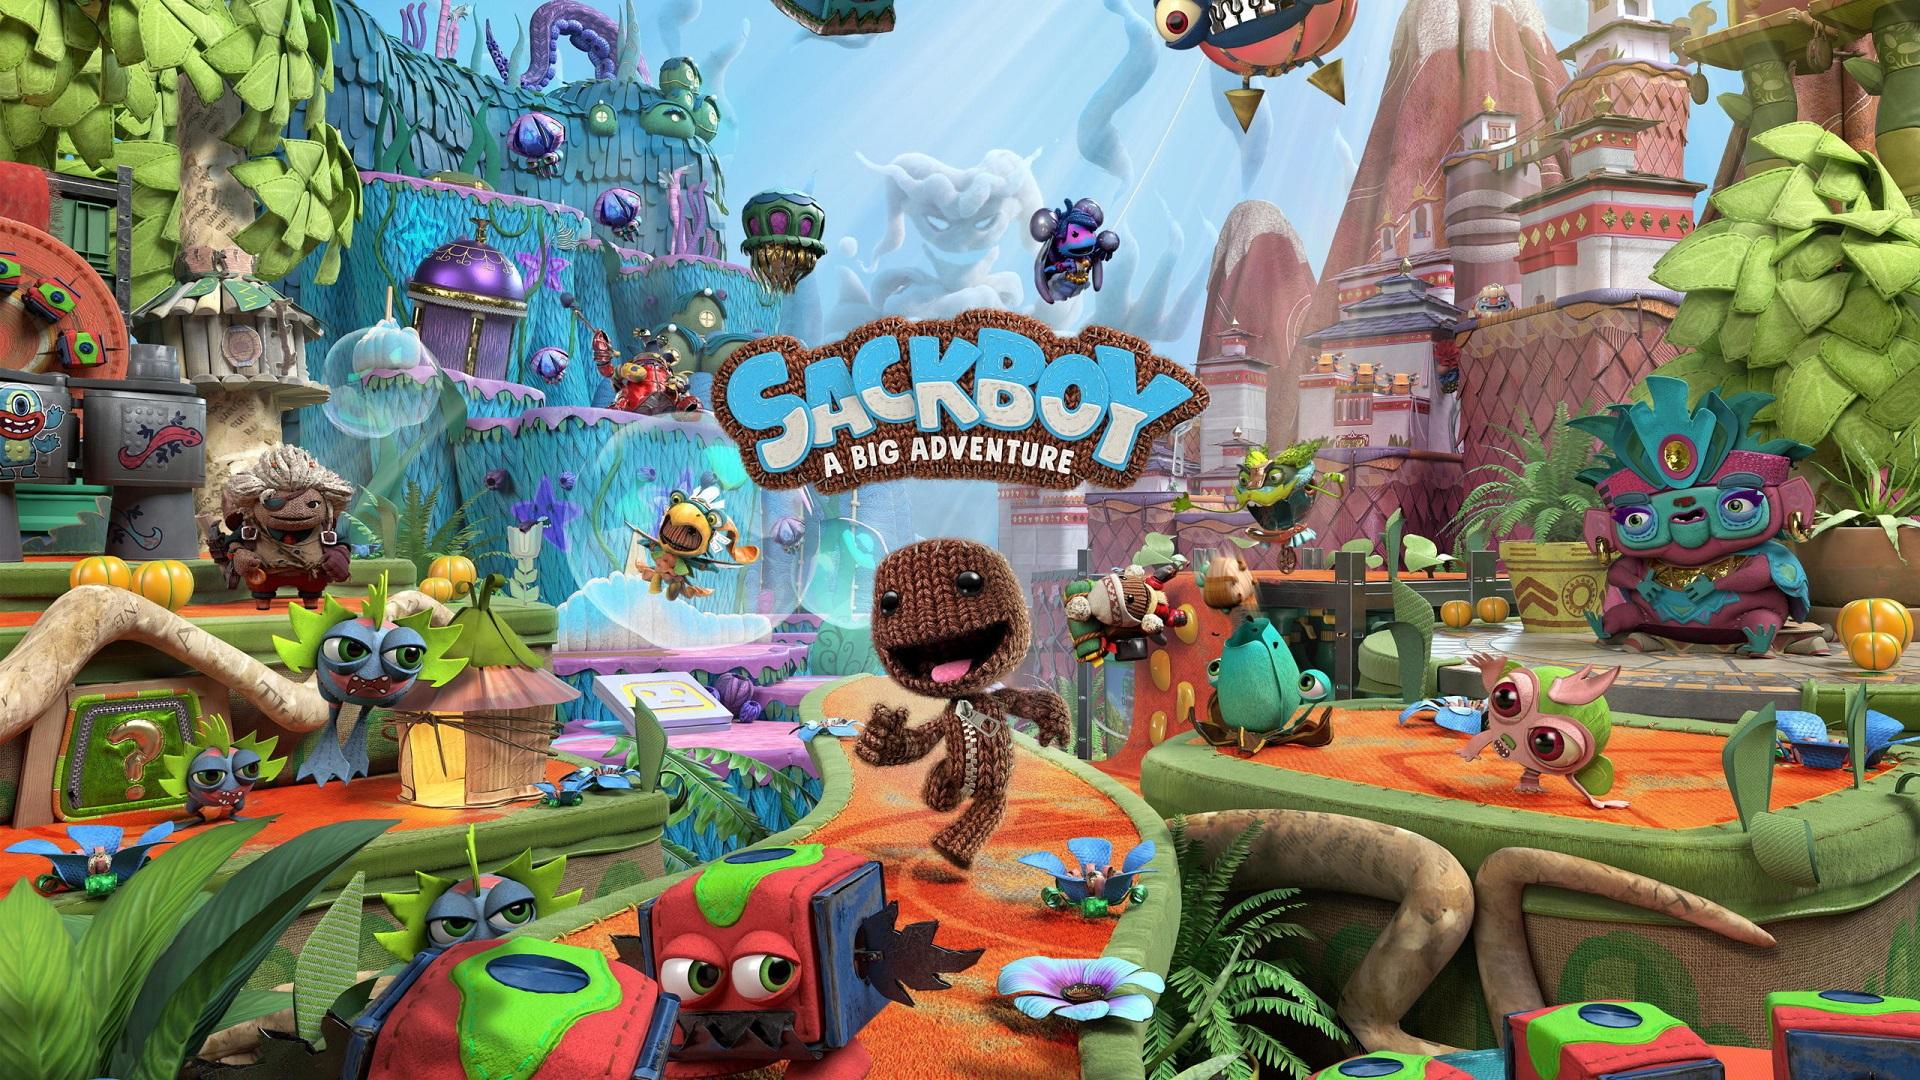 Sackboy A Big Adventure: LittleBigPlanet Servers Temporarily Disabled